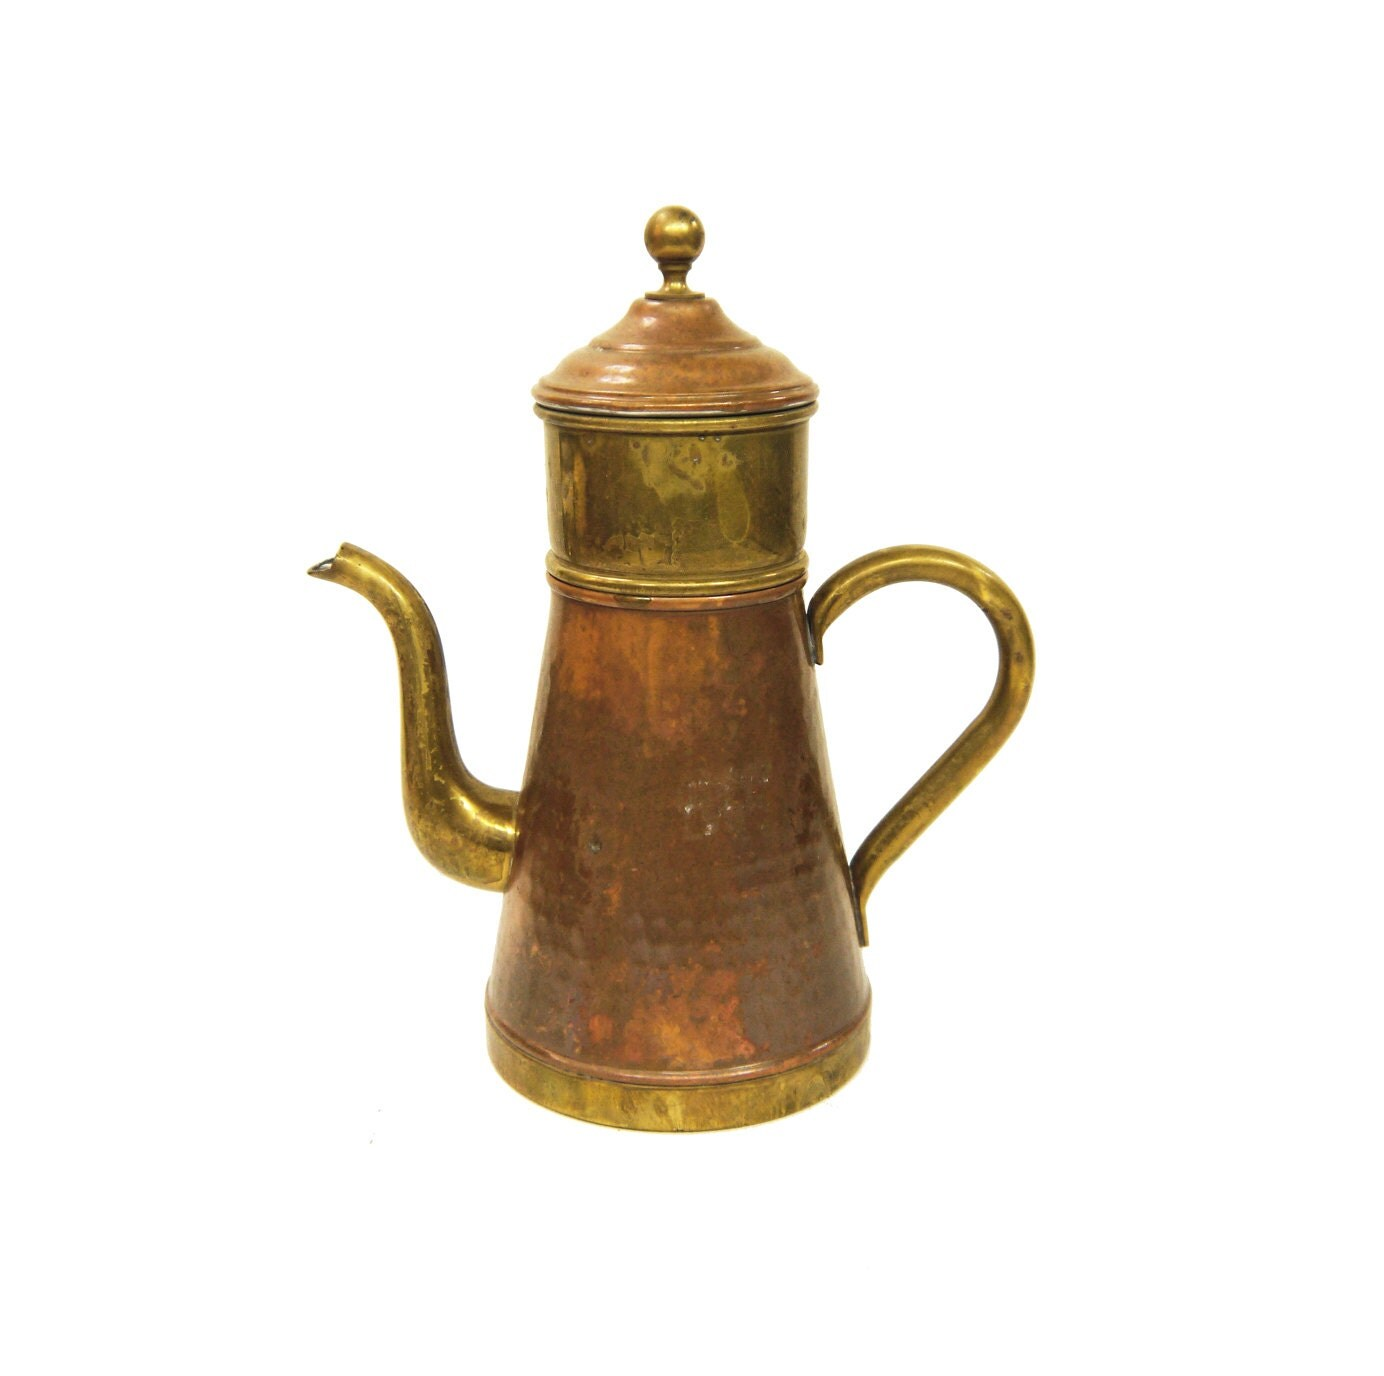 Antique Percolator Coffee Maker : Vintage Copper and Brass Coffee Pot Coffee Maker Percolator